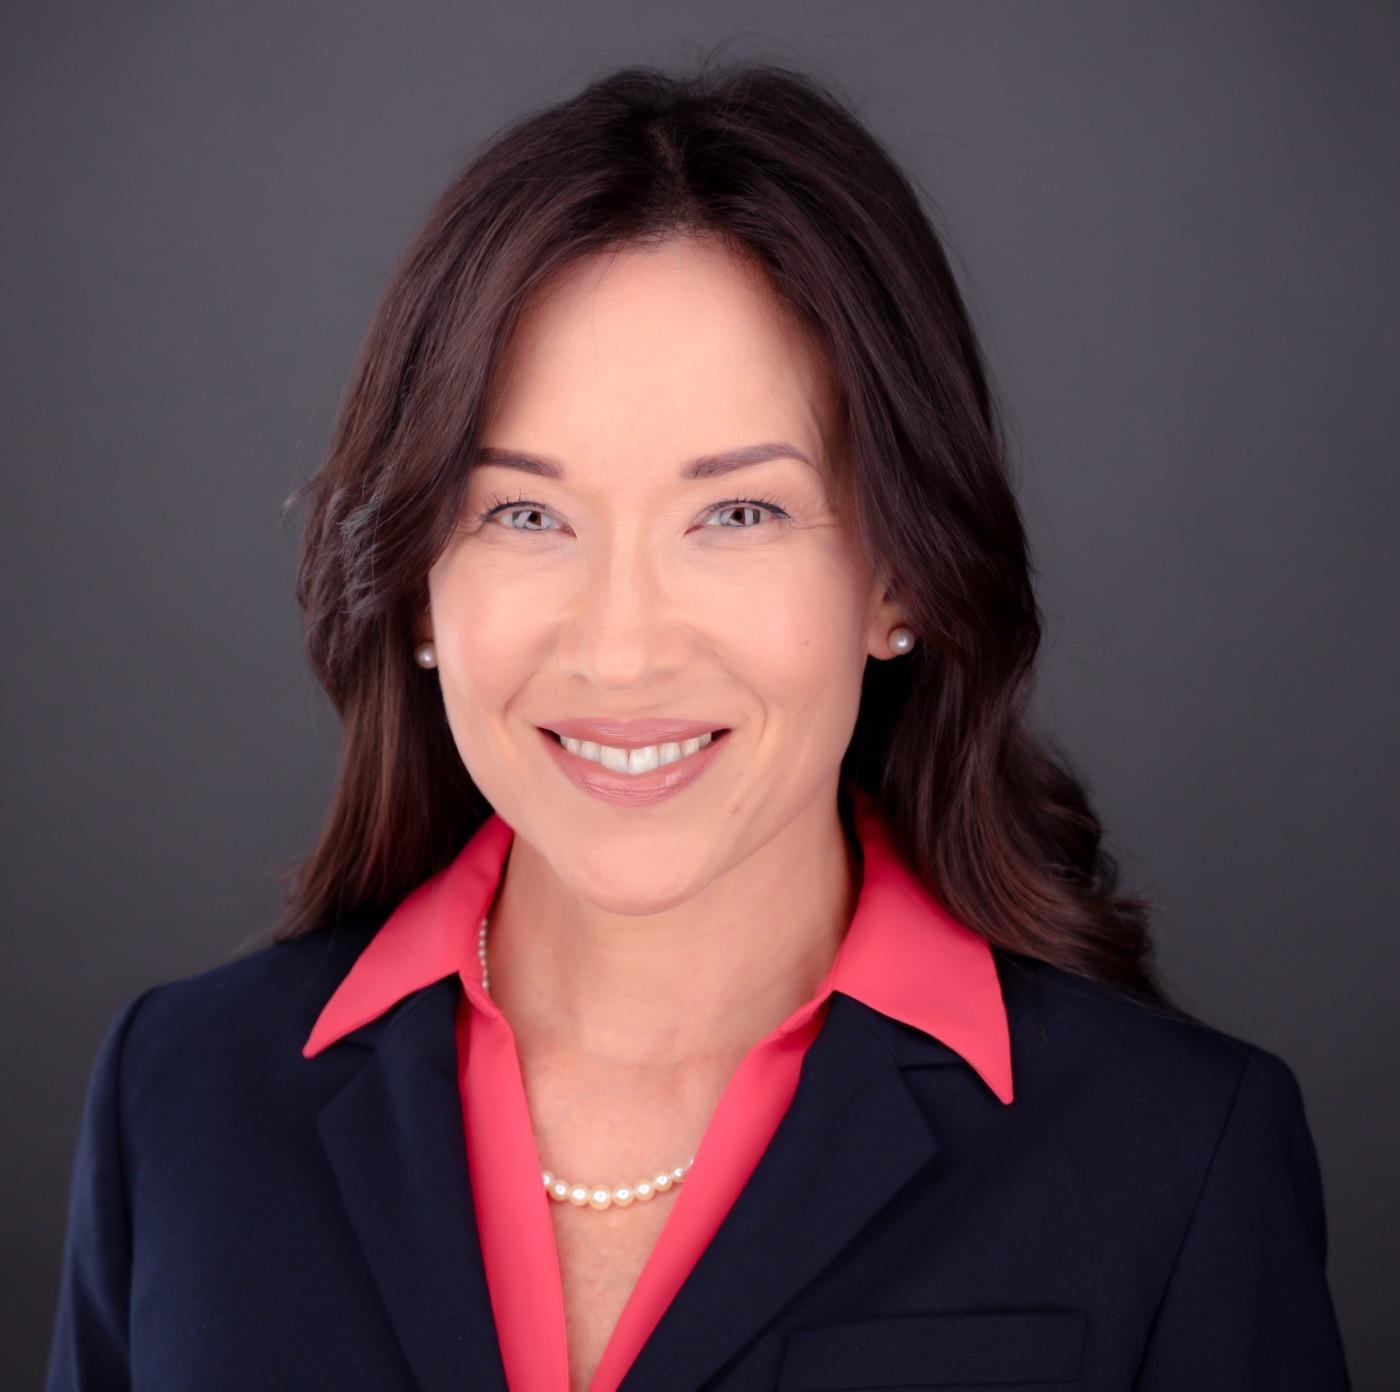 Michele Ho